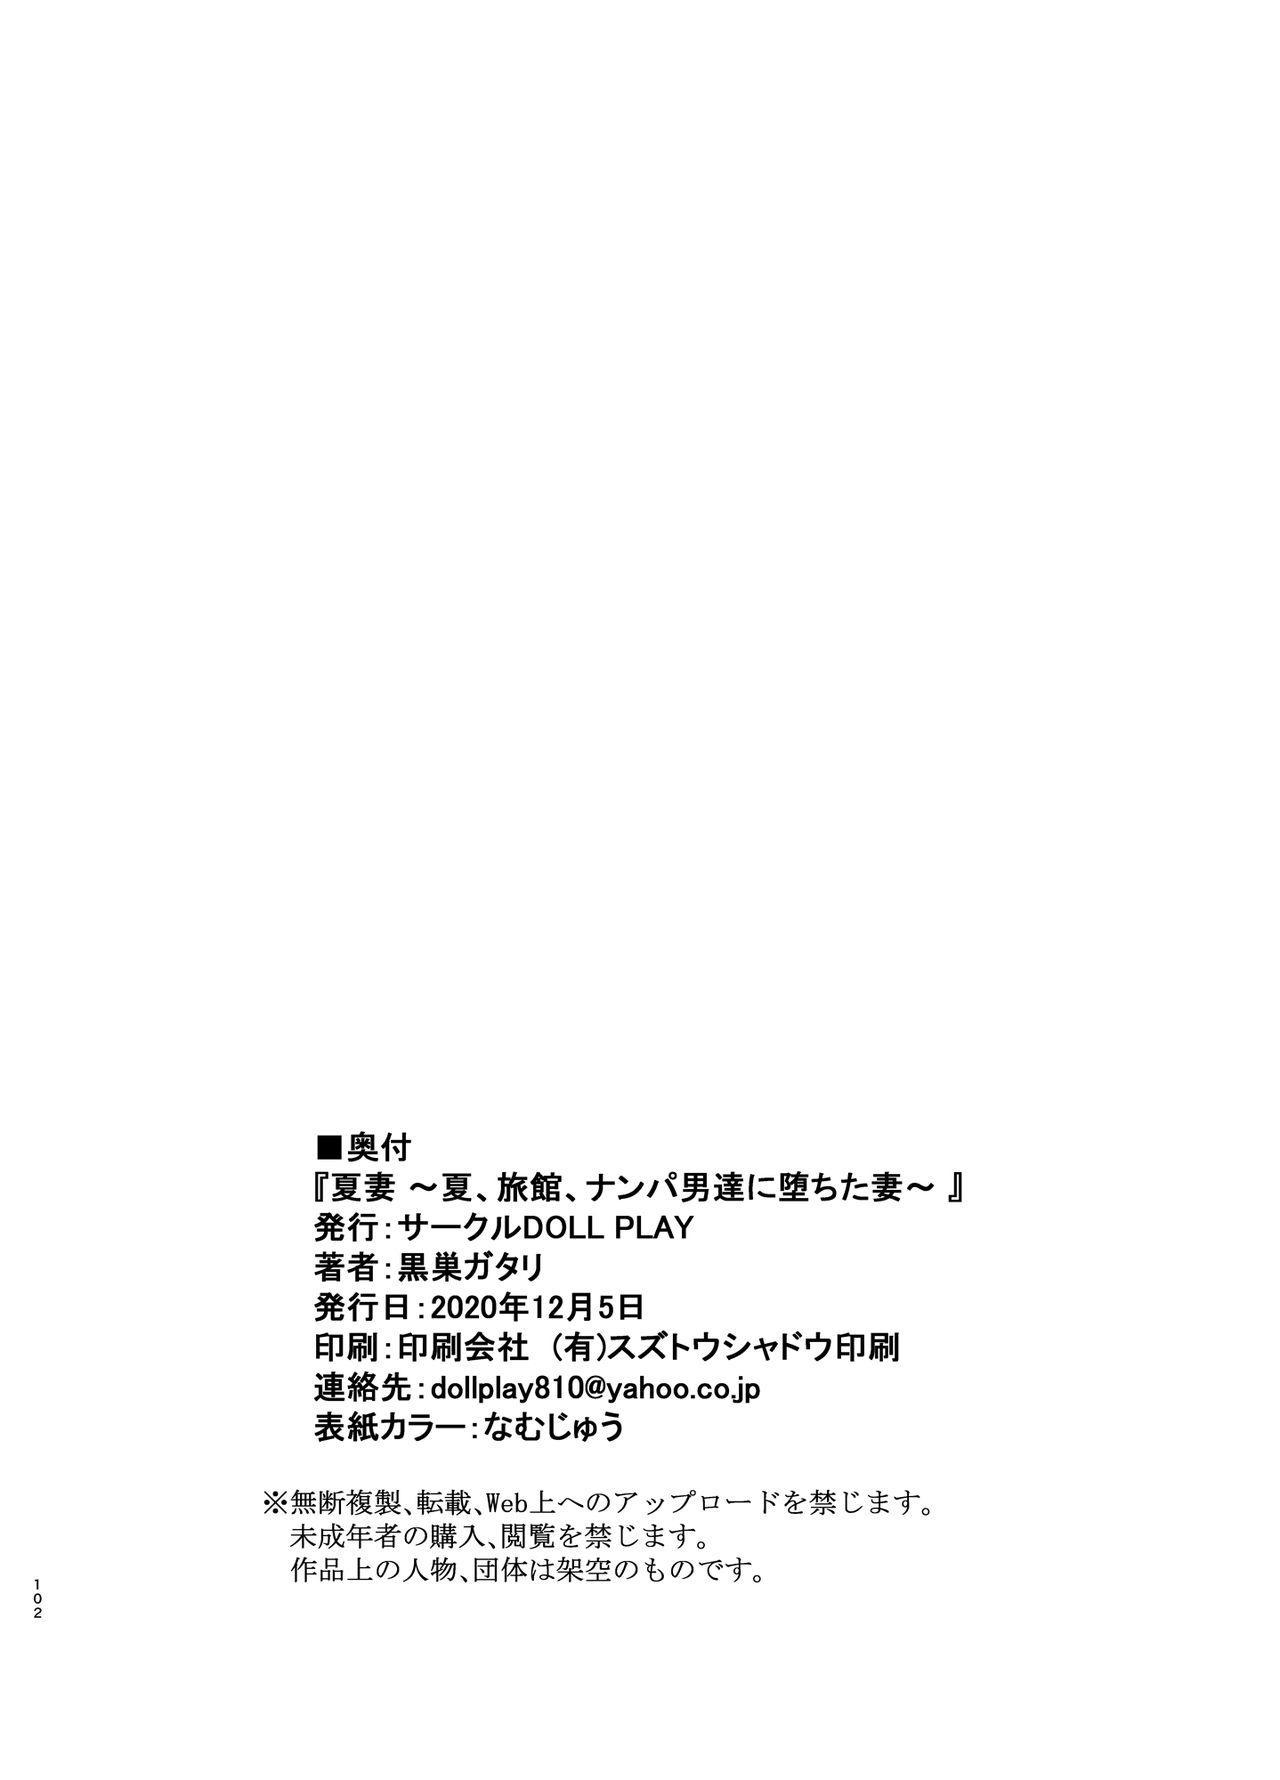 Natsuzuma 99